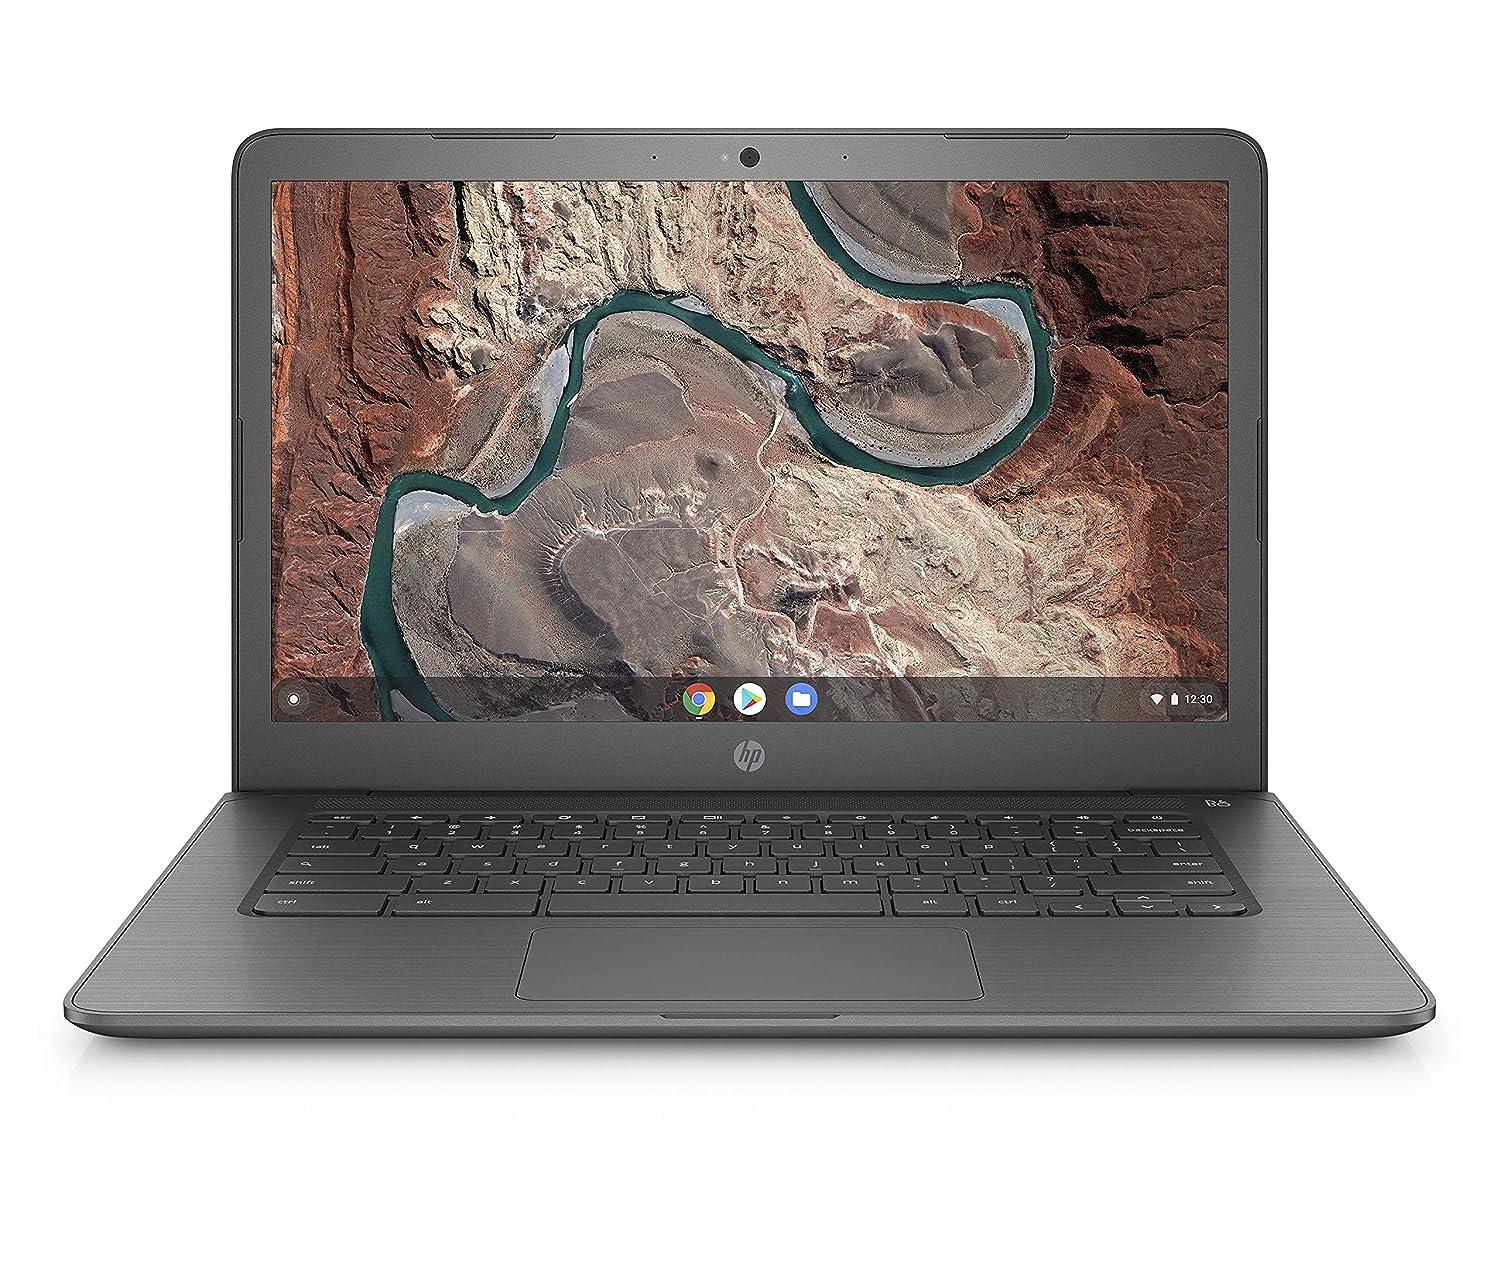 HP Chromebook 14-inch Laptop with 180-degree Hinge, Full HD Screen, AMD Dual-Core A4-9120 Processor, 4 GB SDRAM, 32 GB eMMC Storage, Chrome OS (14-db0040nr, Chalkboard Gray)